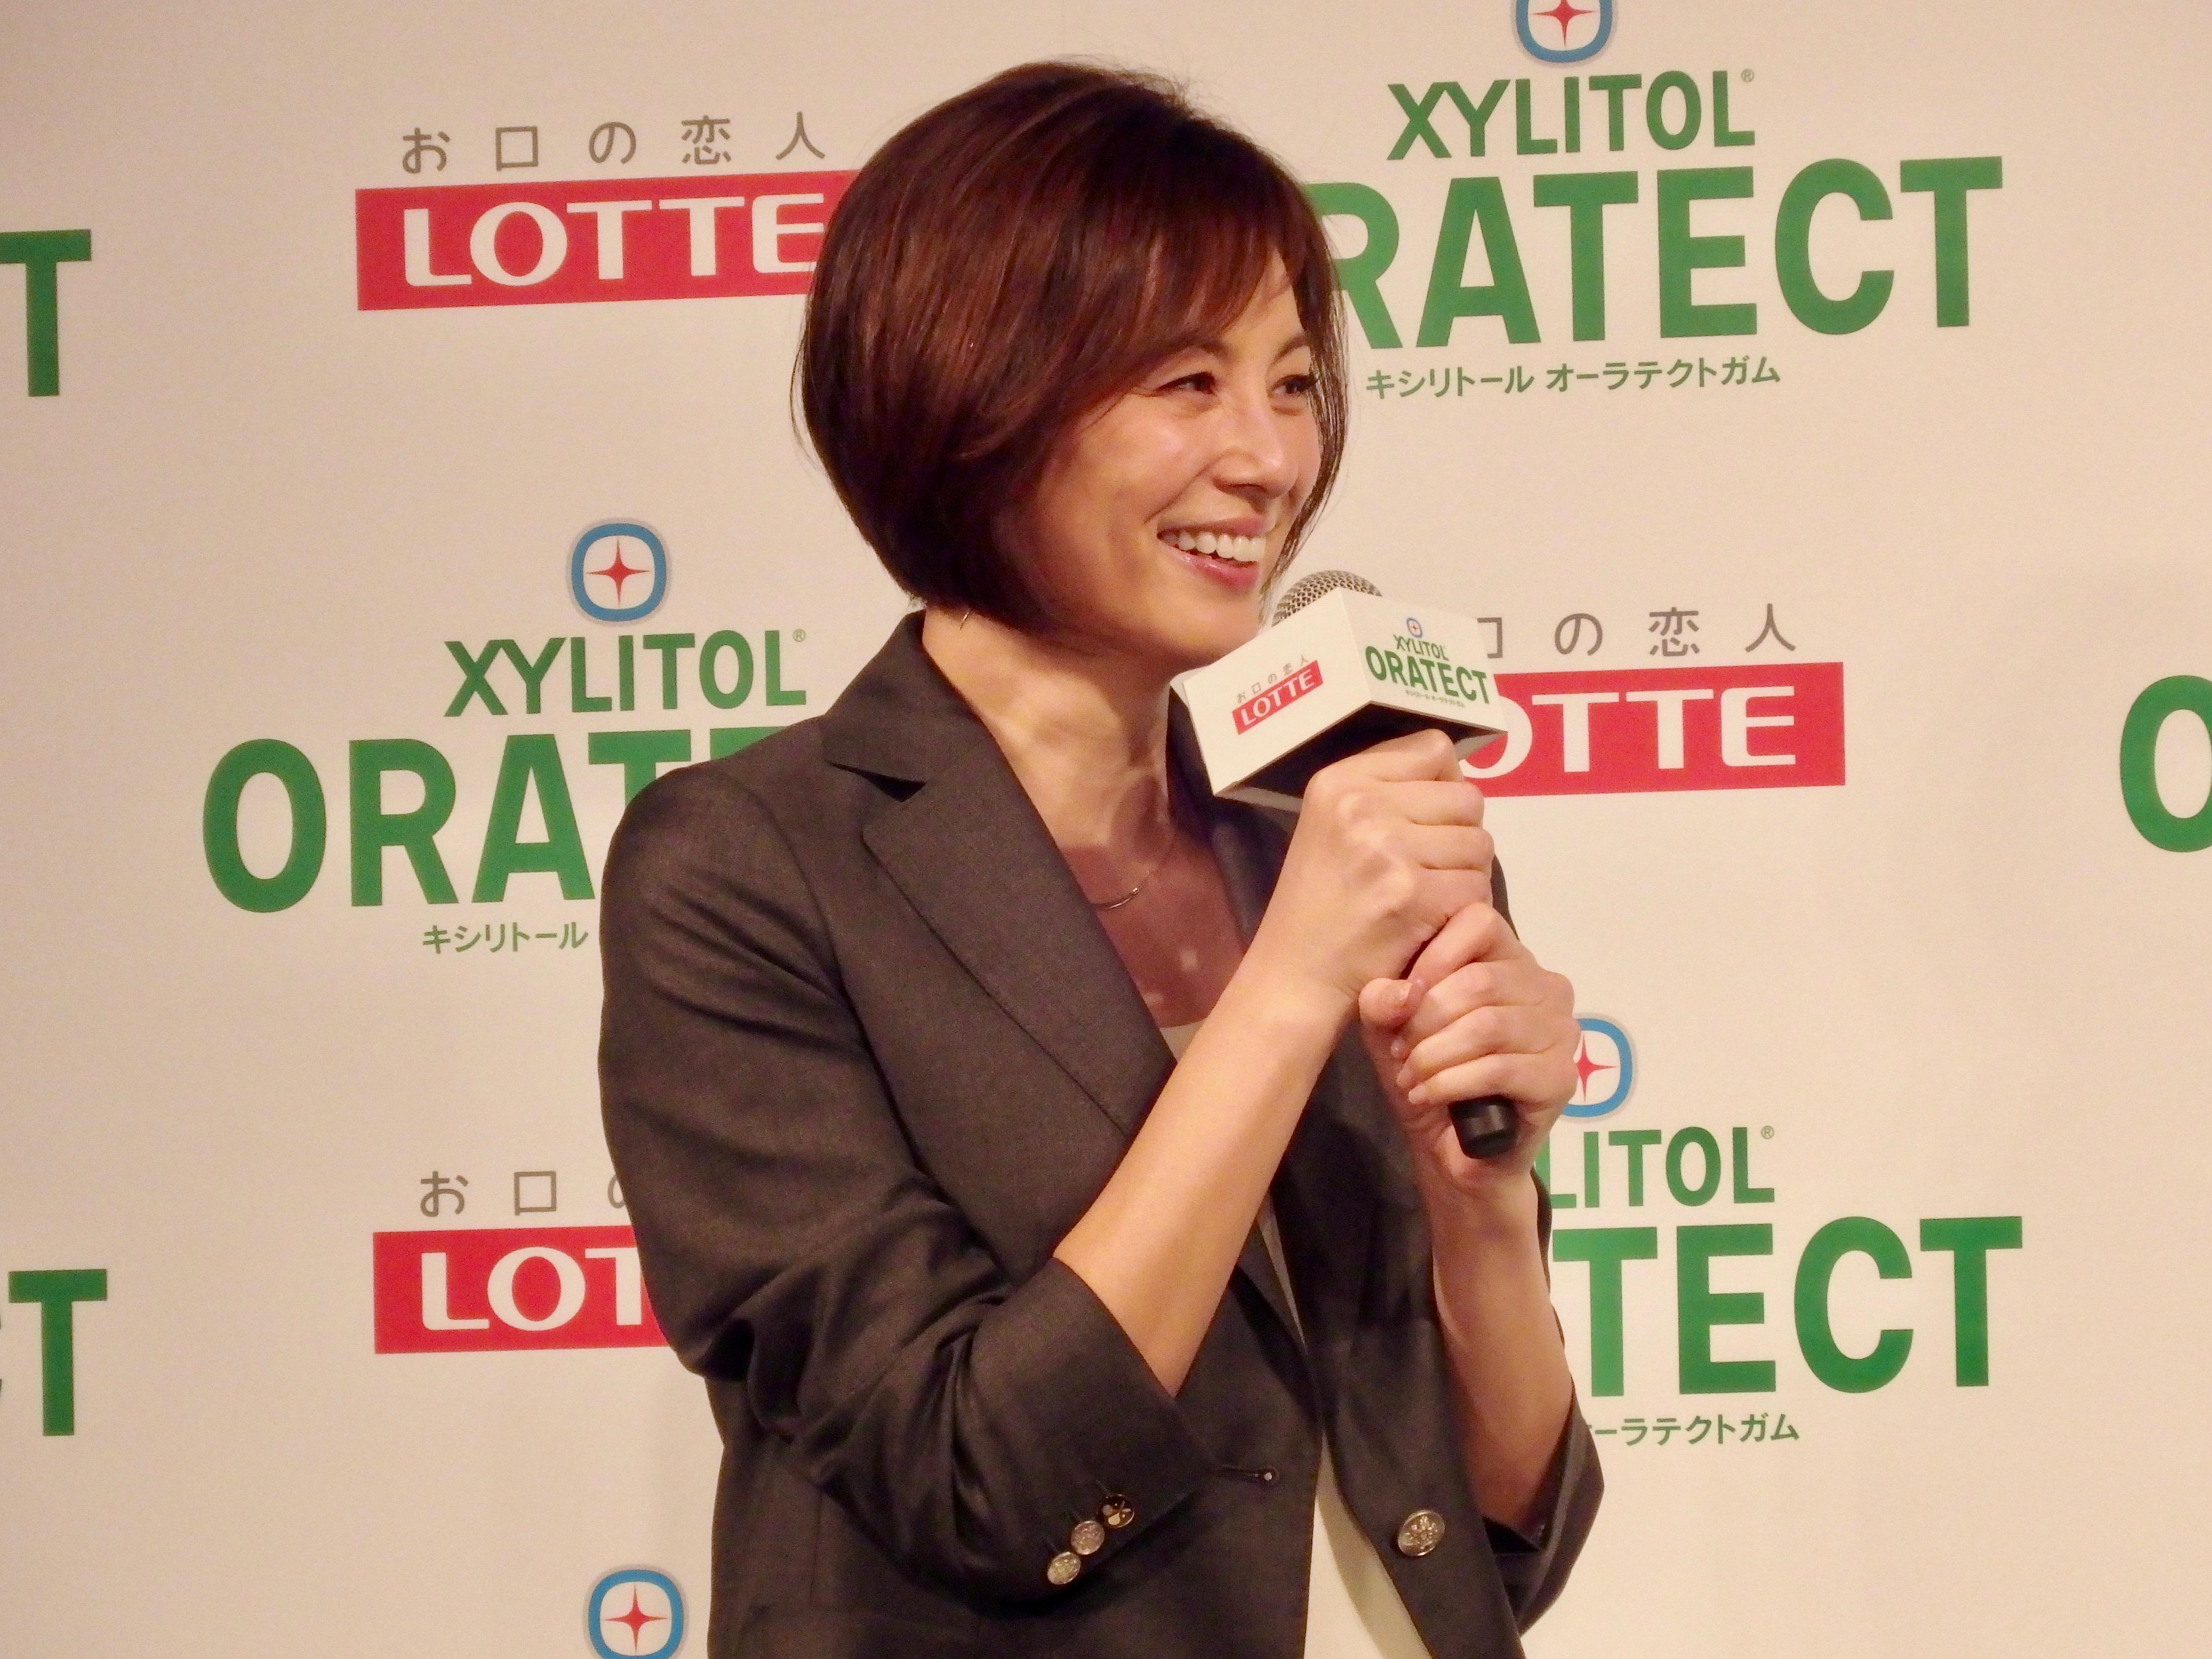 http://news.yoshimoto.co.jp/20170314200816-0a4052ba1daba4a229ddbde3562d2f17985fbf3e.jpg